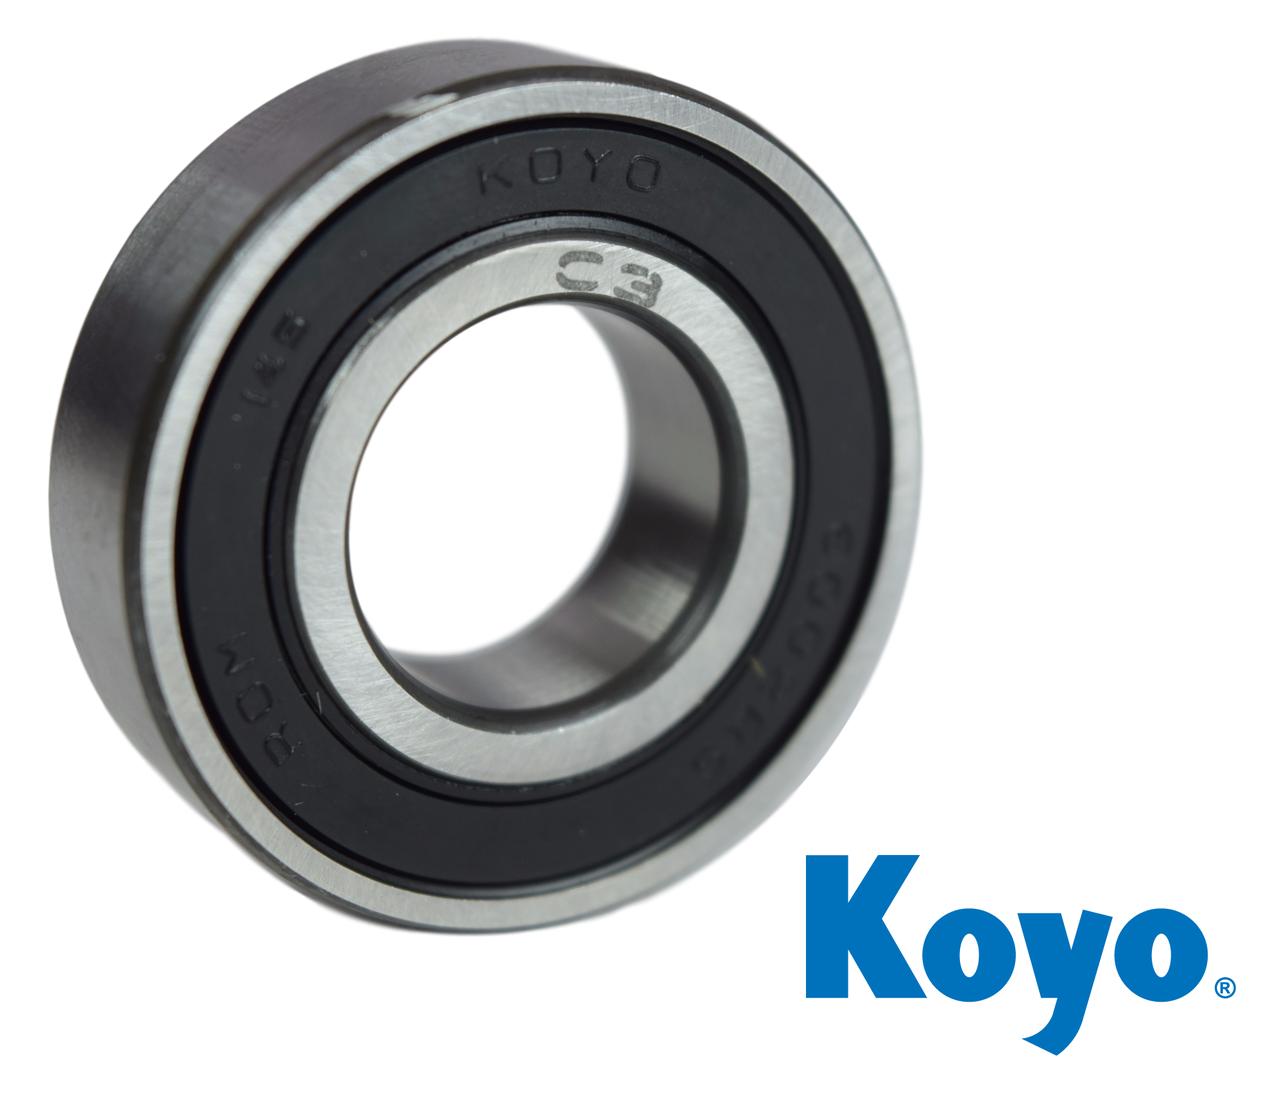 Koyo 6002-2RSC3 Radial Ball Bearing 15X32X9 Image